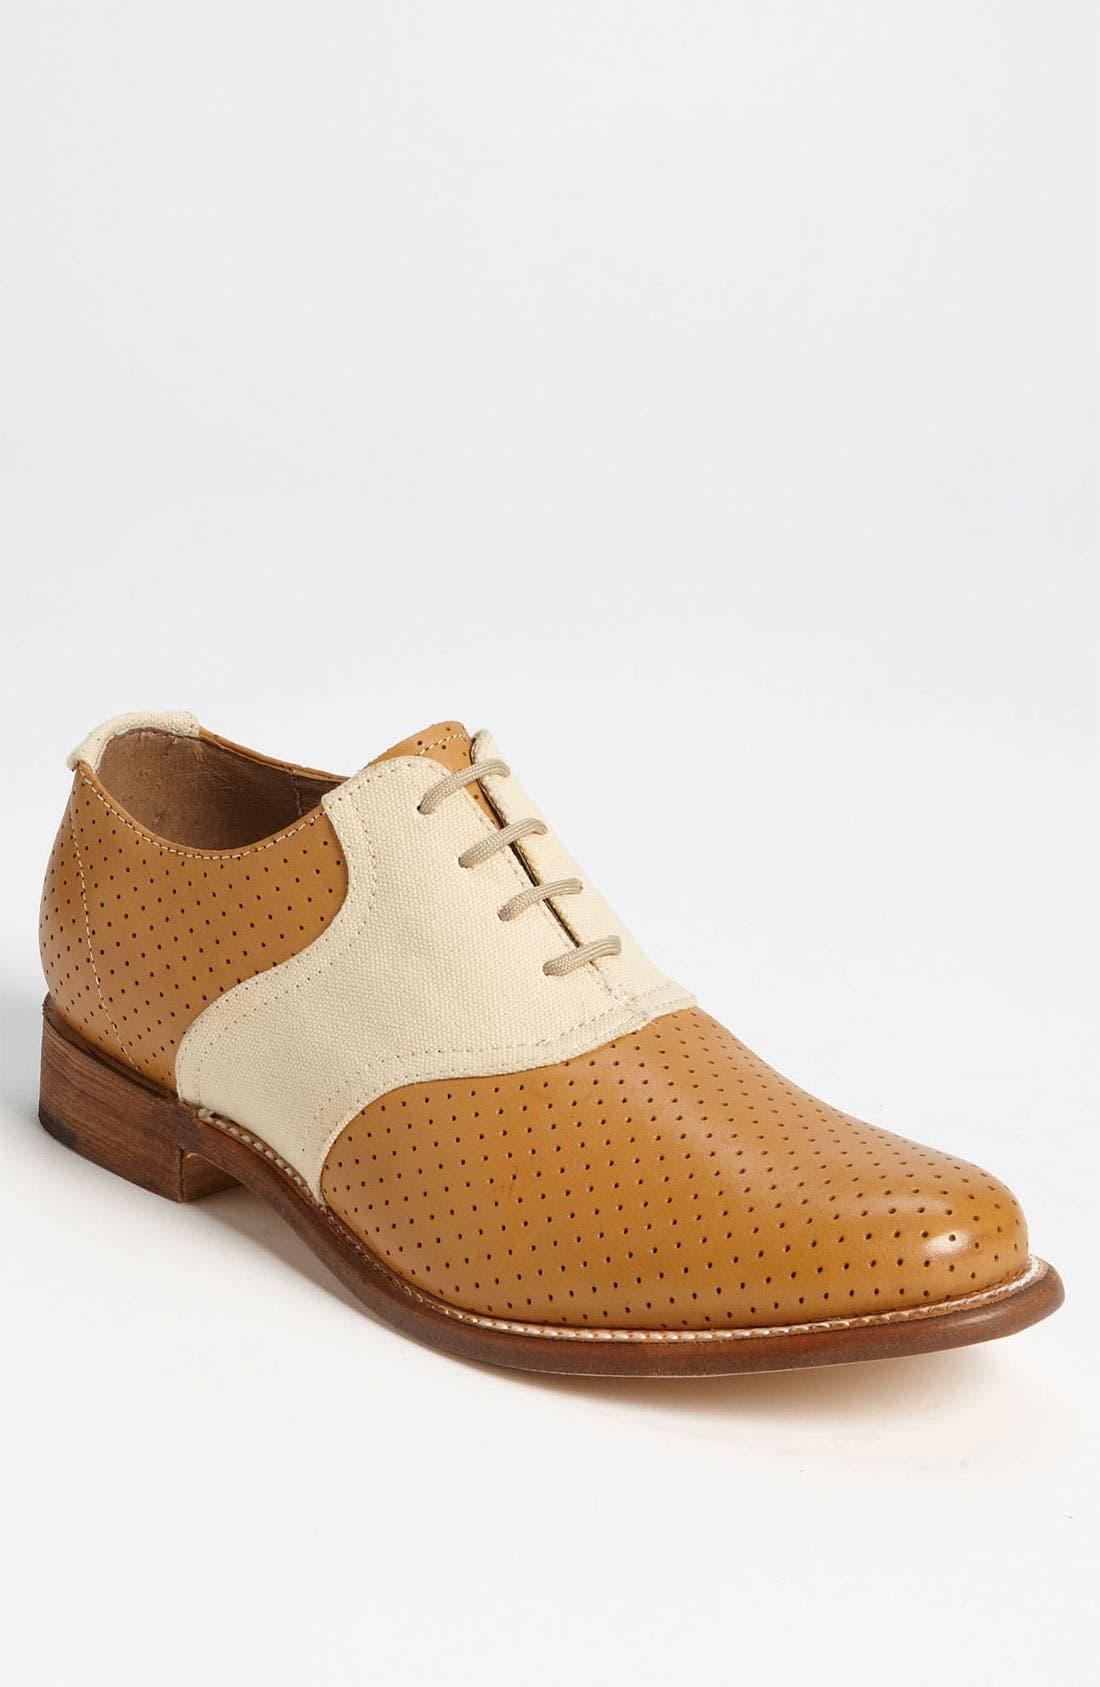 Main Image - J.D. Fisk 'Nikko' Saddle Shoe